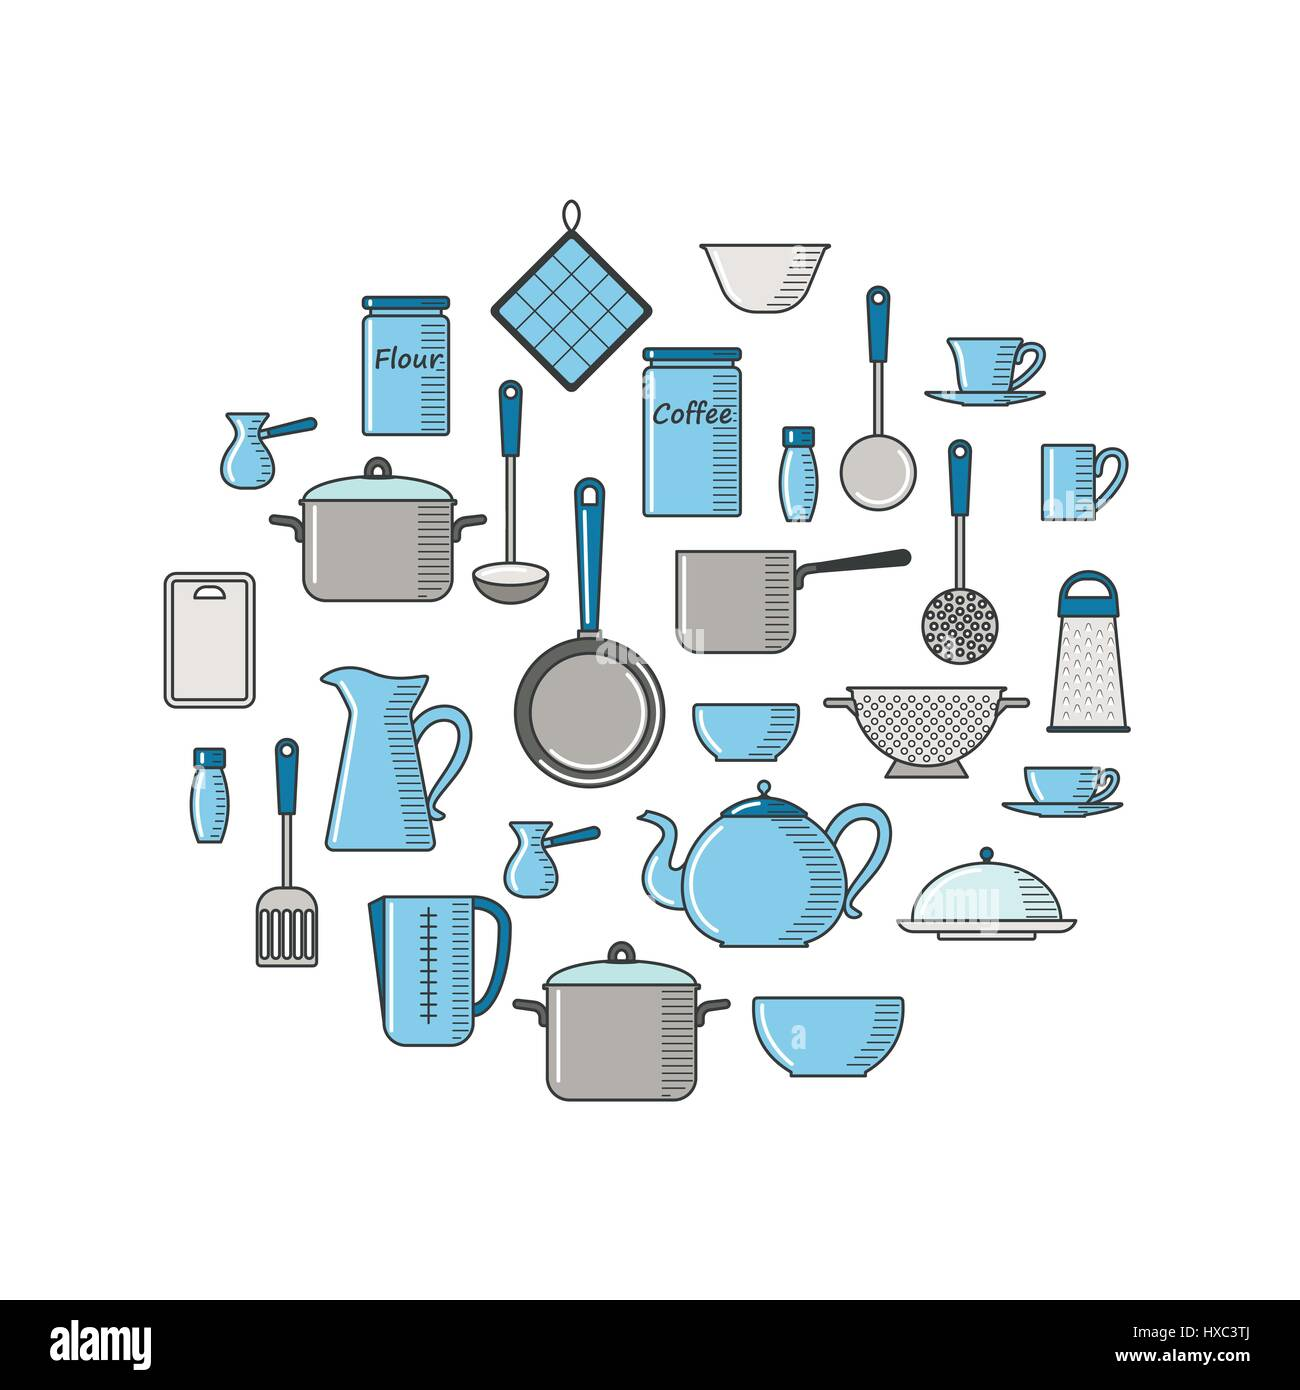 Thin line illustration with kitchen utensils - Stock Vector